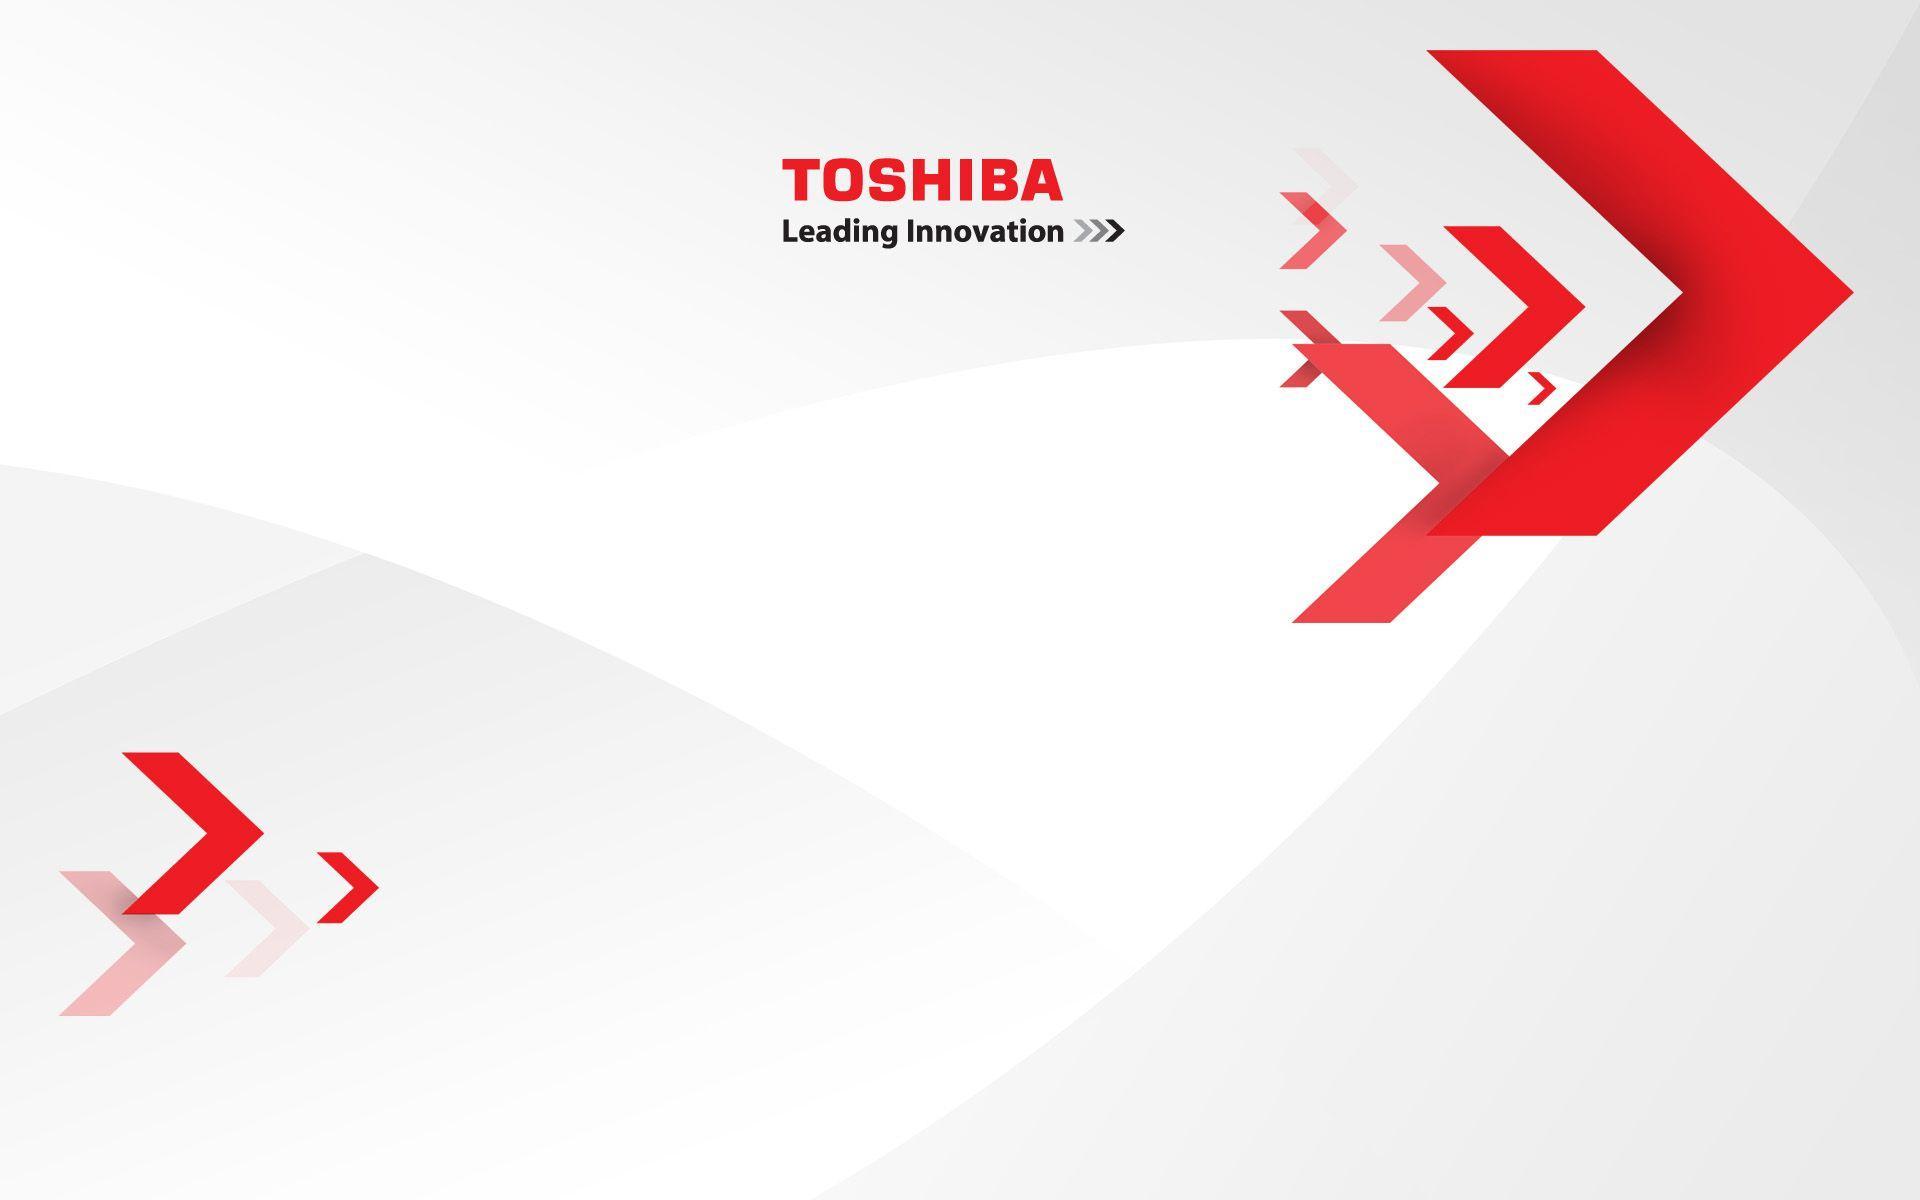 Toshiba 4K Wallpapers - Top Free ...